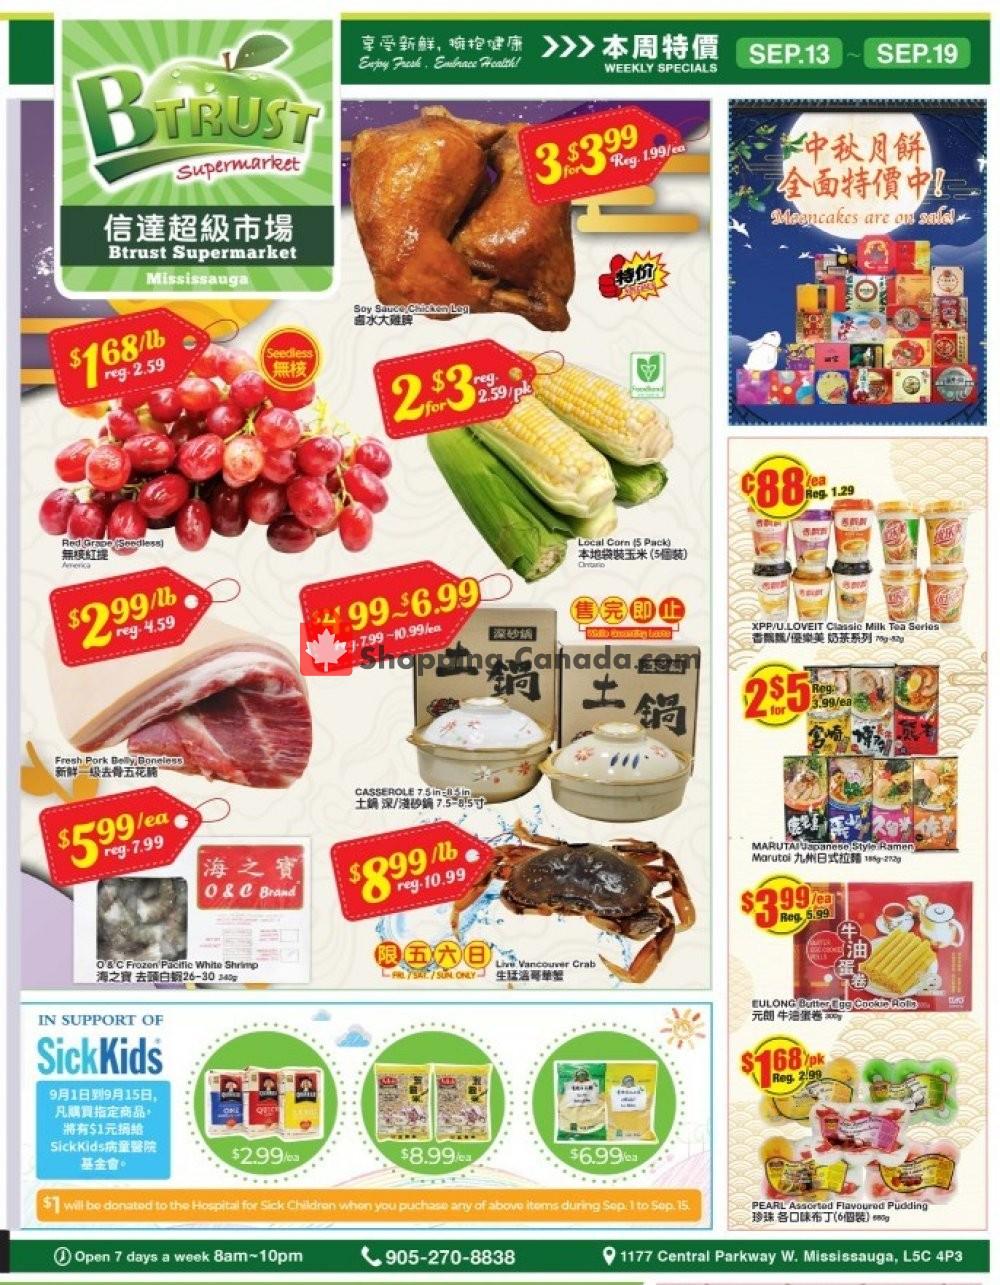 Flyer Btrust Supermarket Canada - from Friday September 13, 2019 to Thursday September 19, 2019